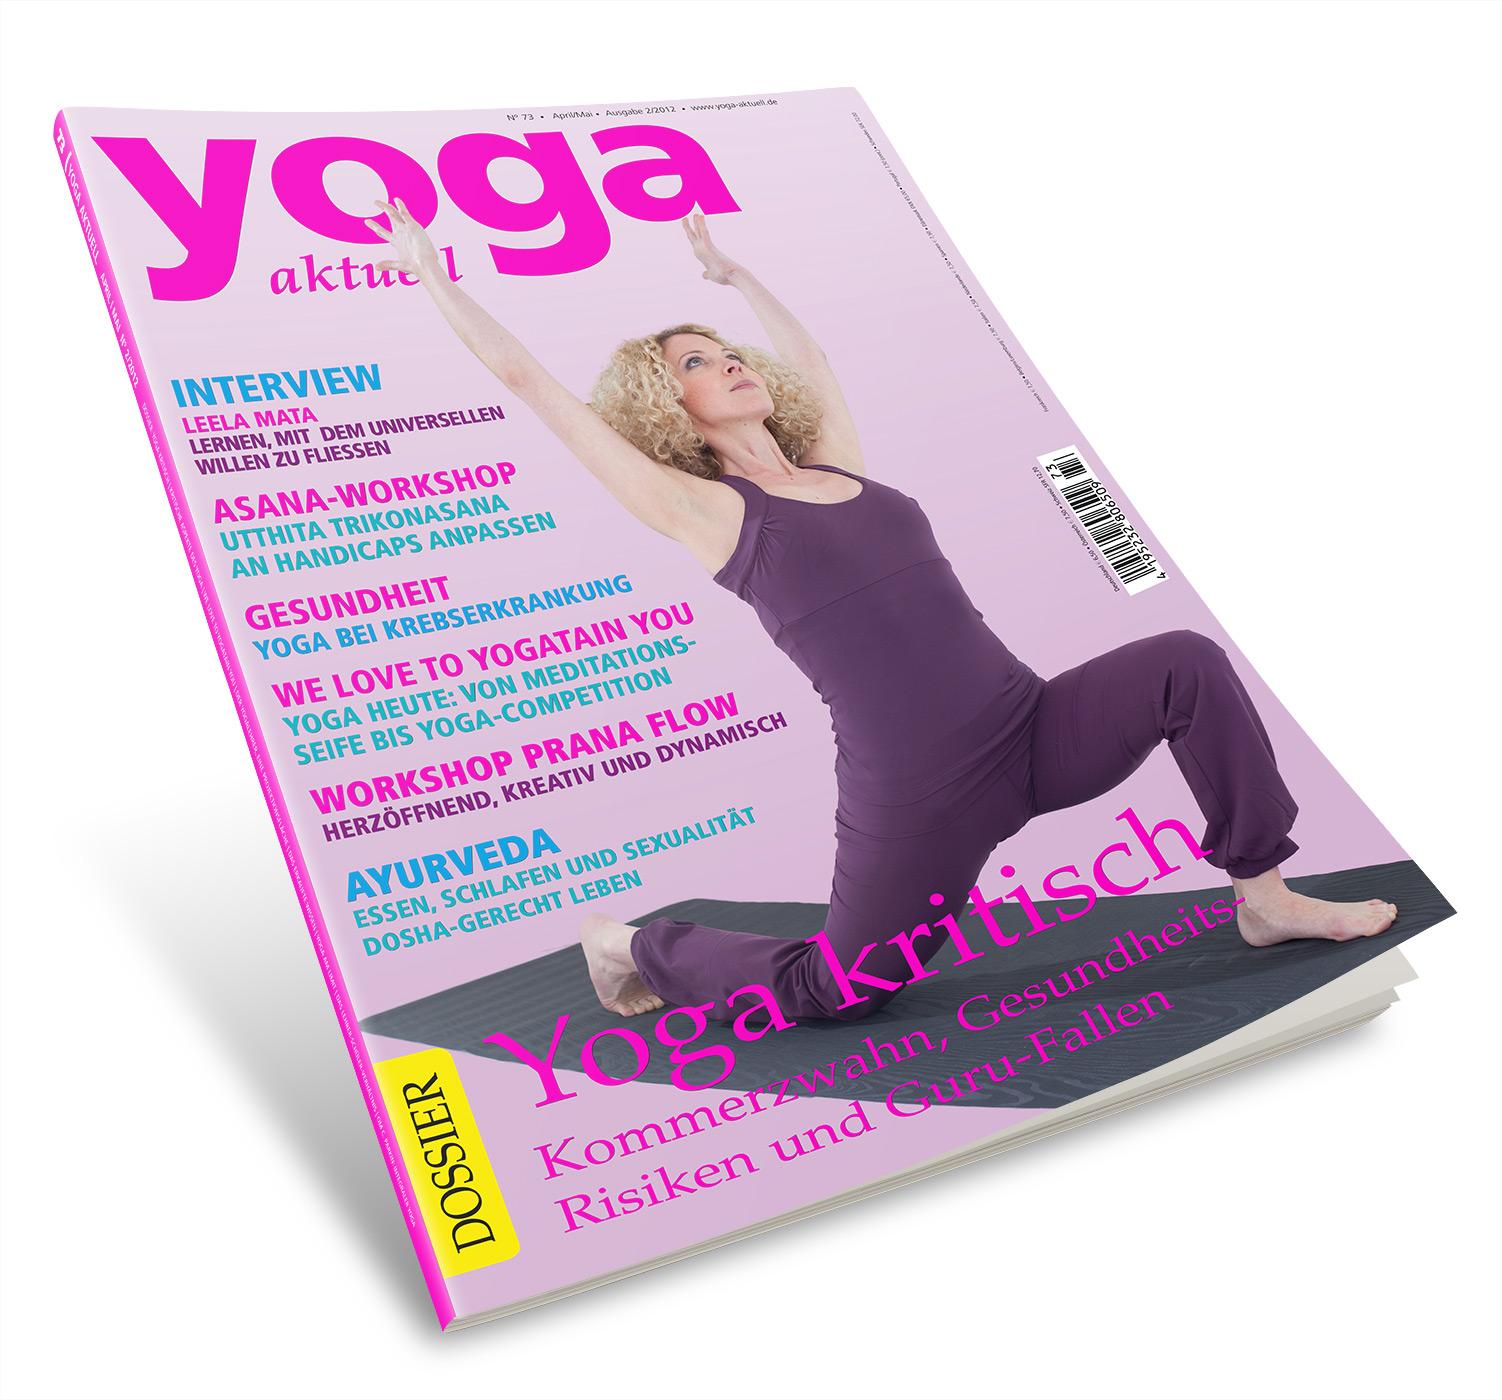 Yoga Aktuell 73 - 02/2012